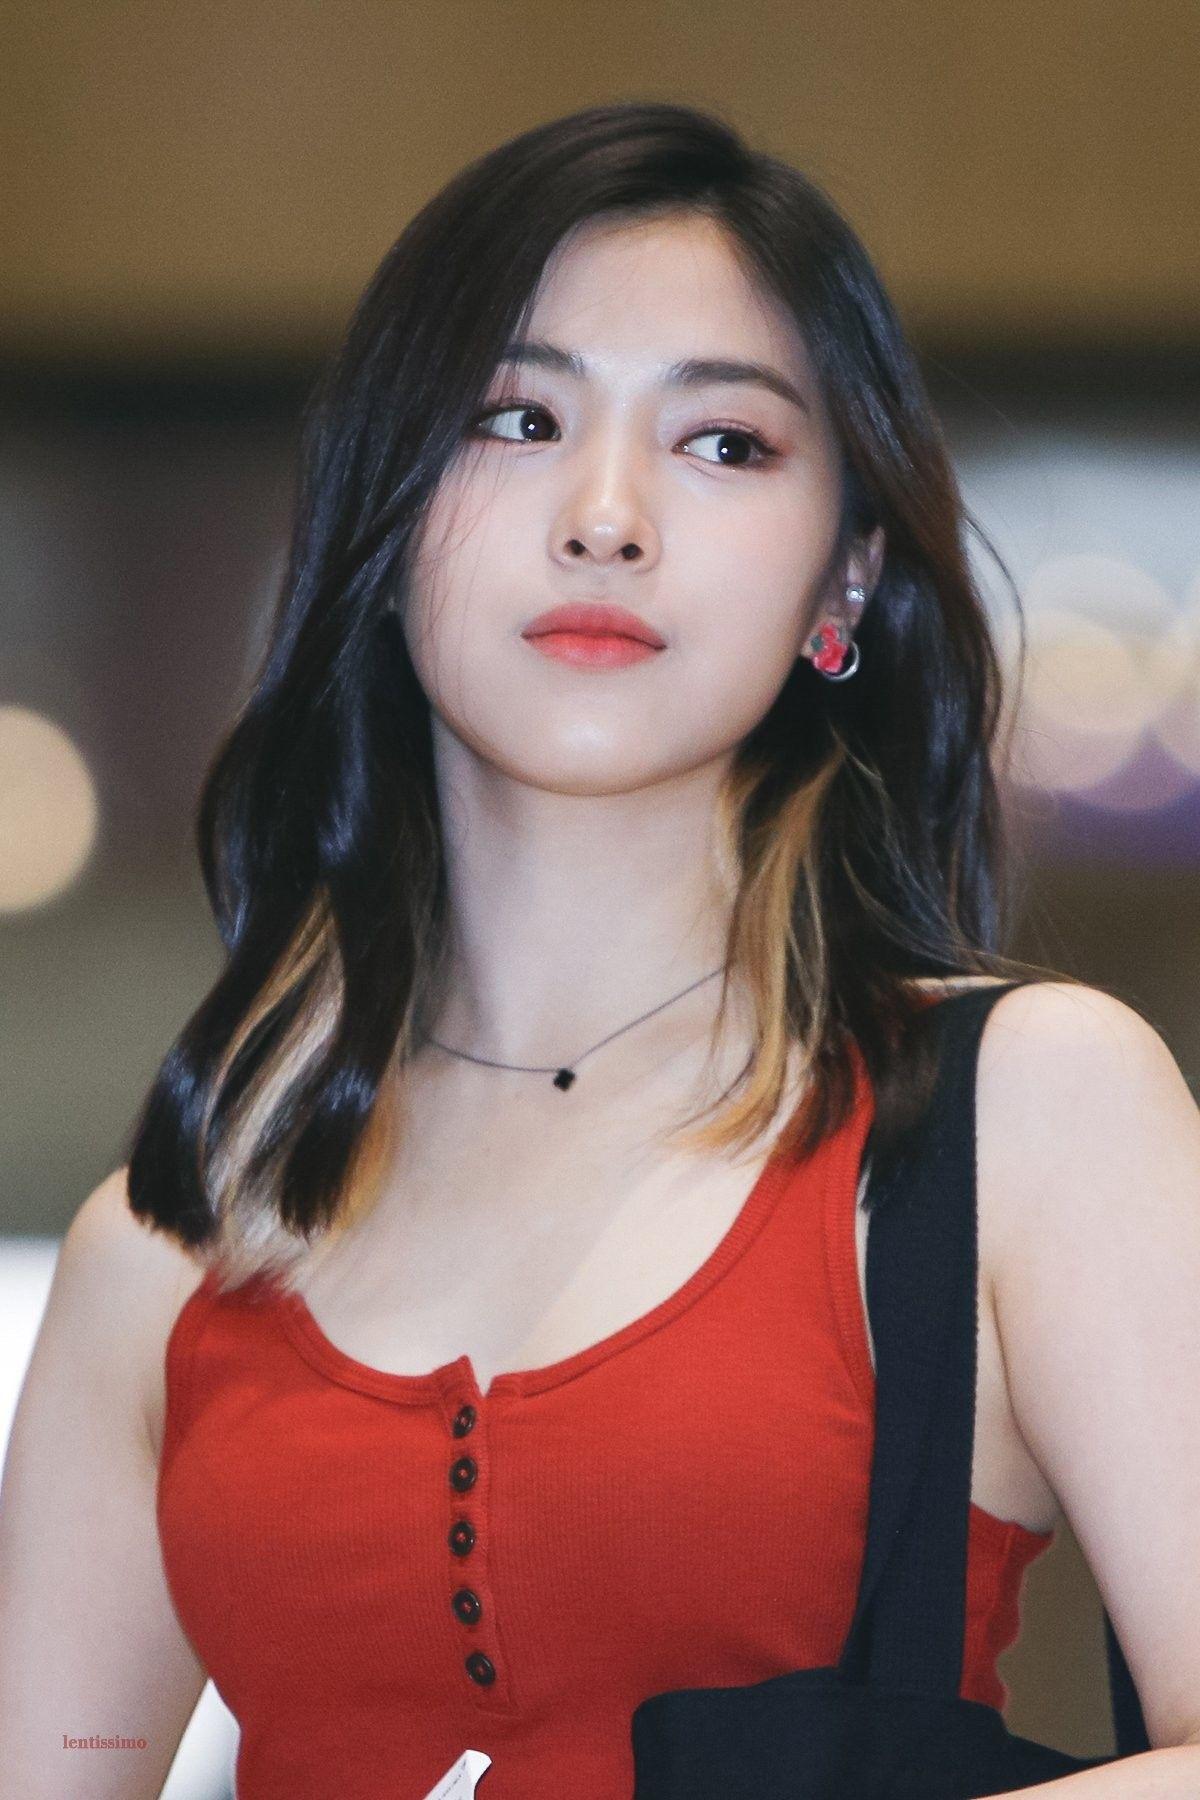 Itzy Ryujin 190517 Gimpo Airport To Japan For Kcon Japan 2019 Gaya Rambut Gaya Rambut Korea Wanita Cantik